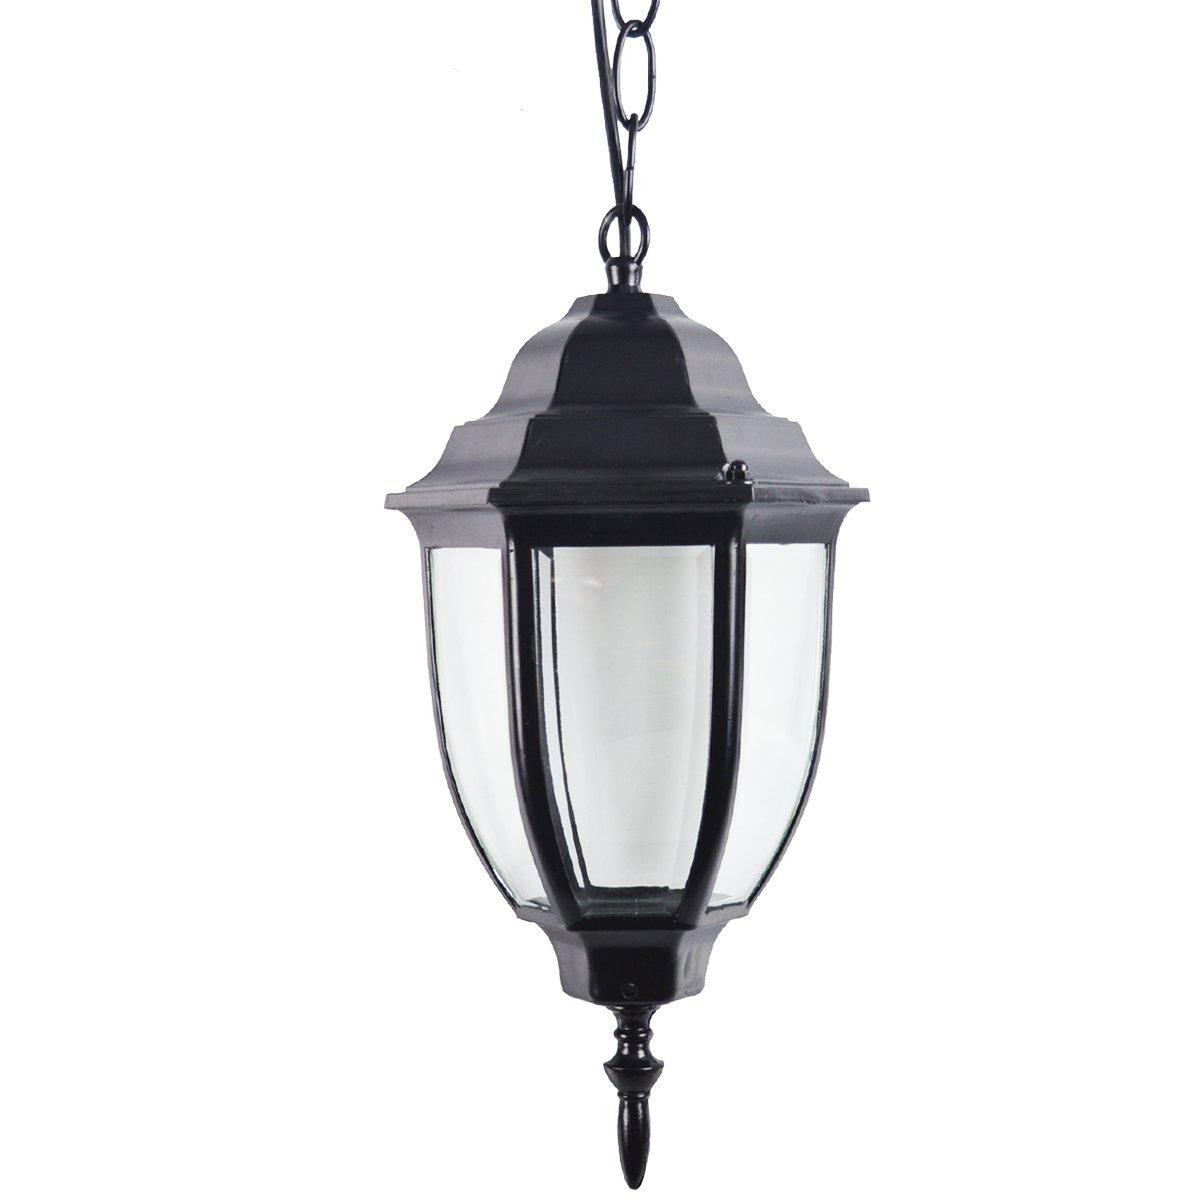 ZHMA Retro Garden Pendant Light, Hanging Lantern, E26/E27 Landscape Lighting Fixtures Aluminum Glass Porch,Villa, Balcony,Fence, Decora Light